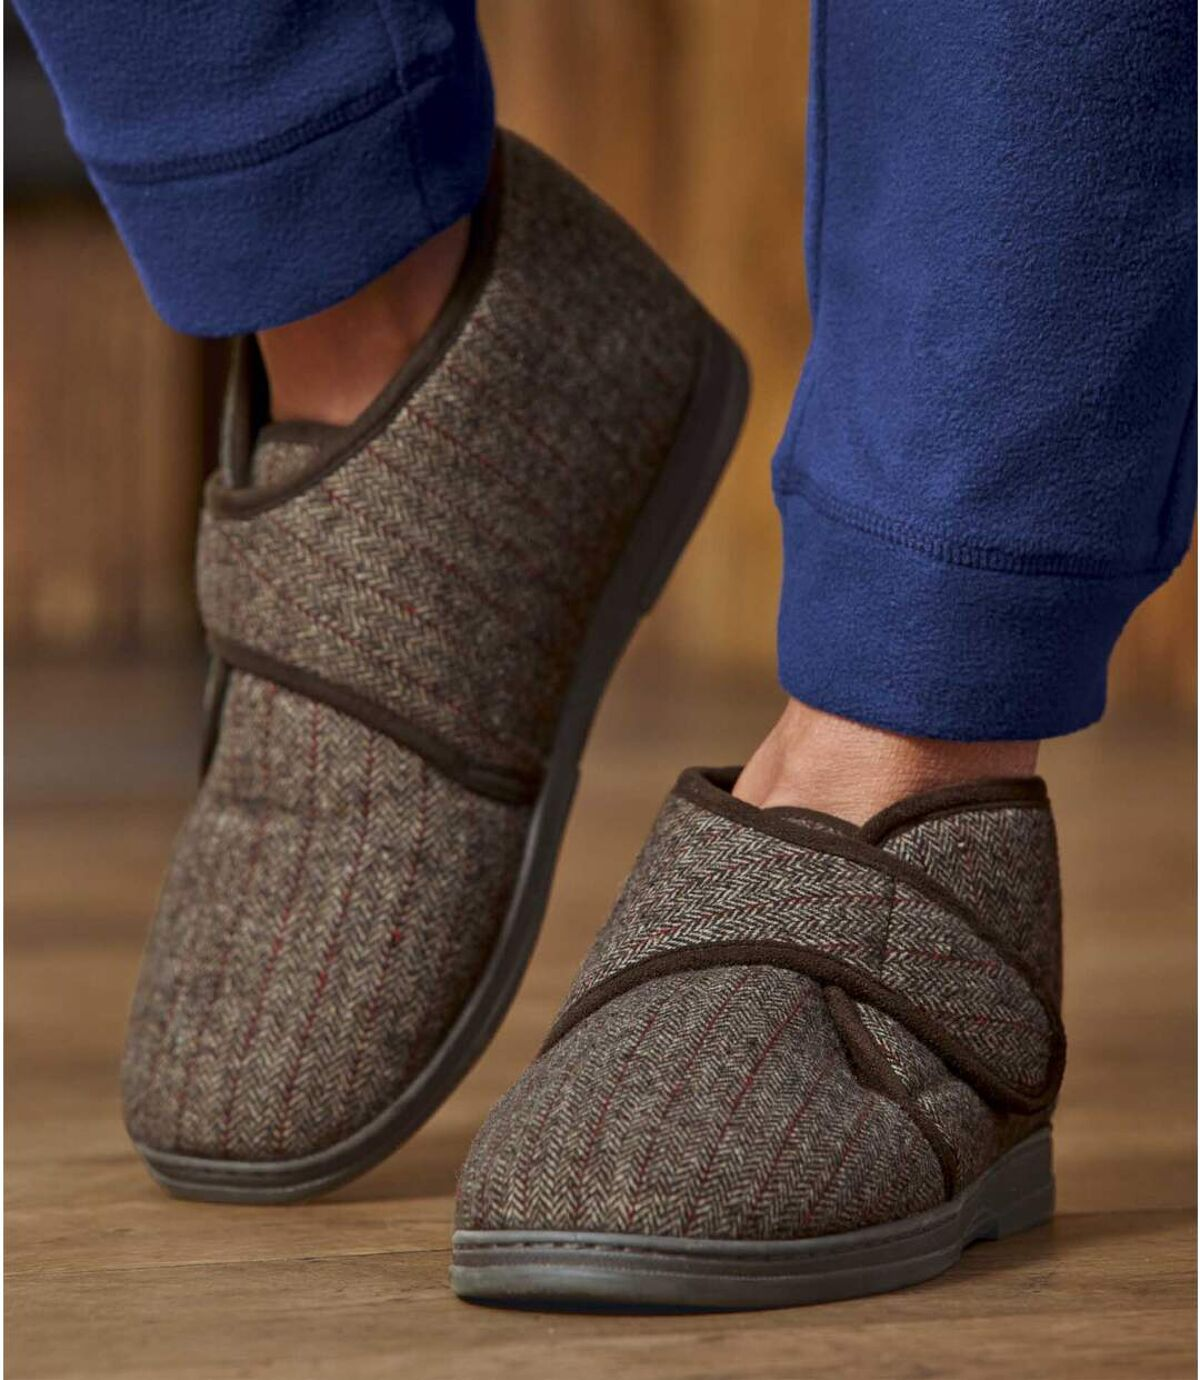 Pánske zateplené vyššie papuče na suchý zips Atlas For Men